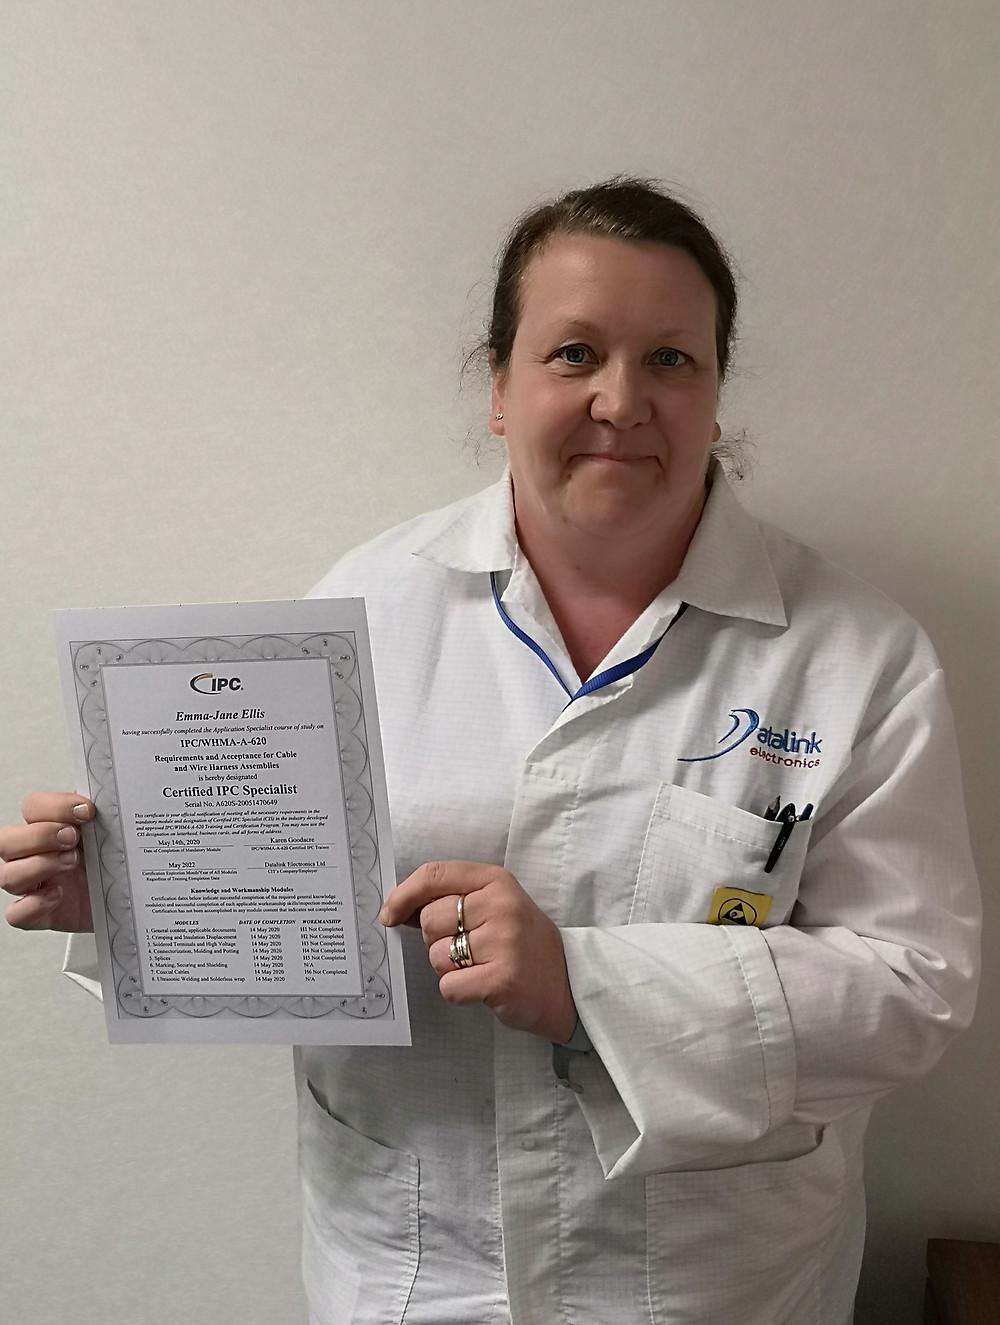 Emma Ellis holding IPC 620 certificate